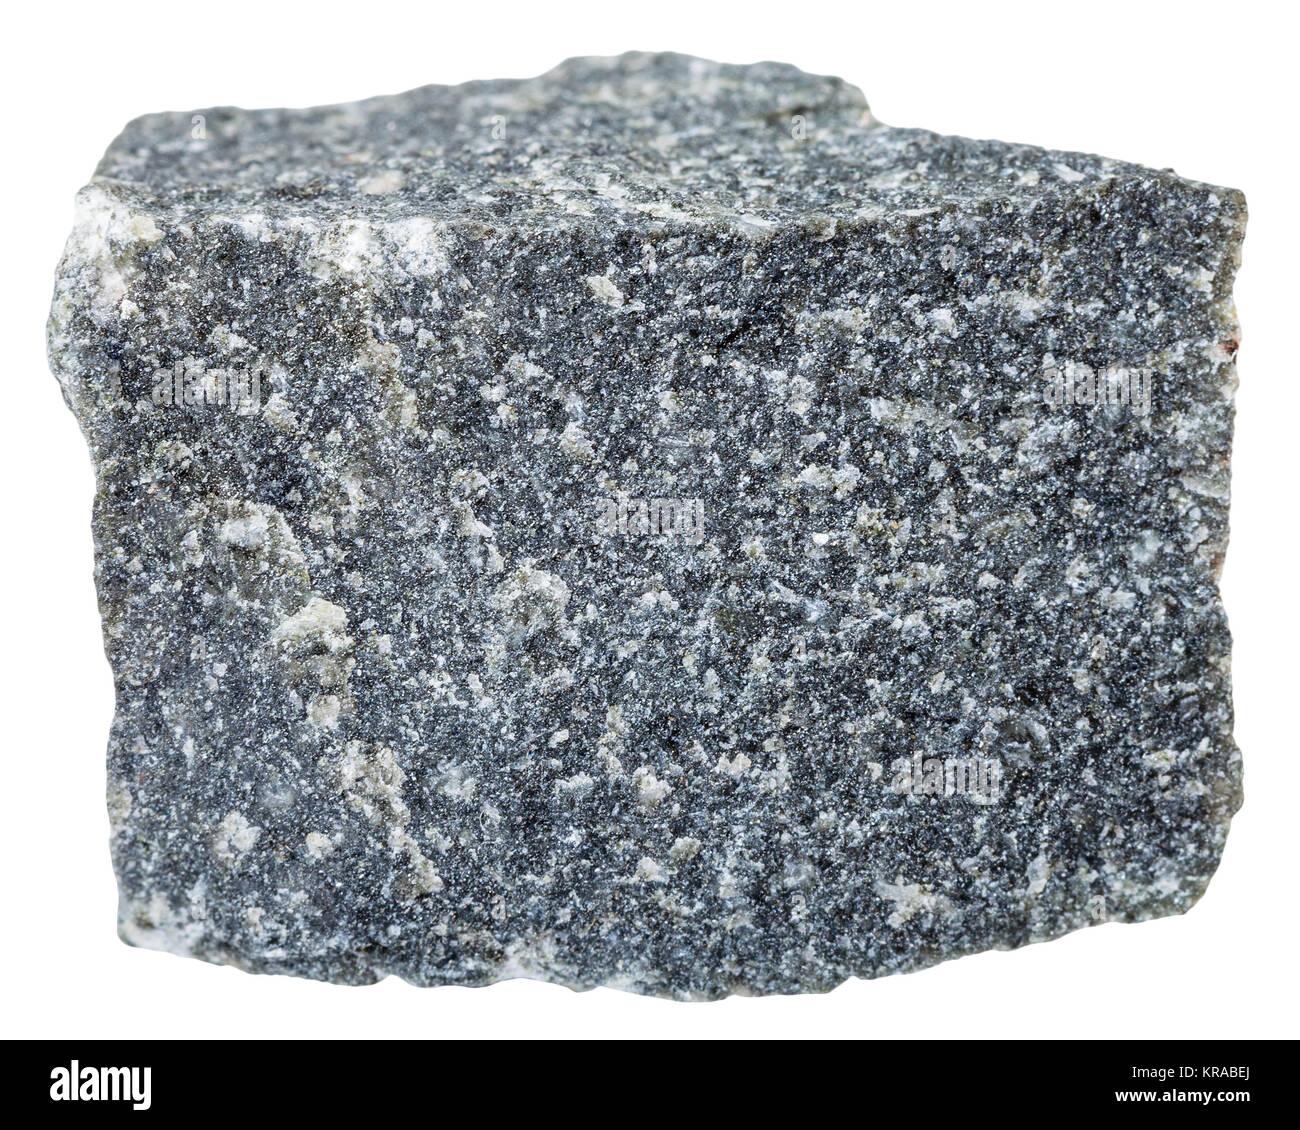 Andesite Stone Isolated On White Background Stock Photo